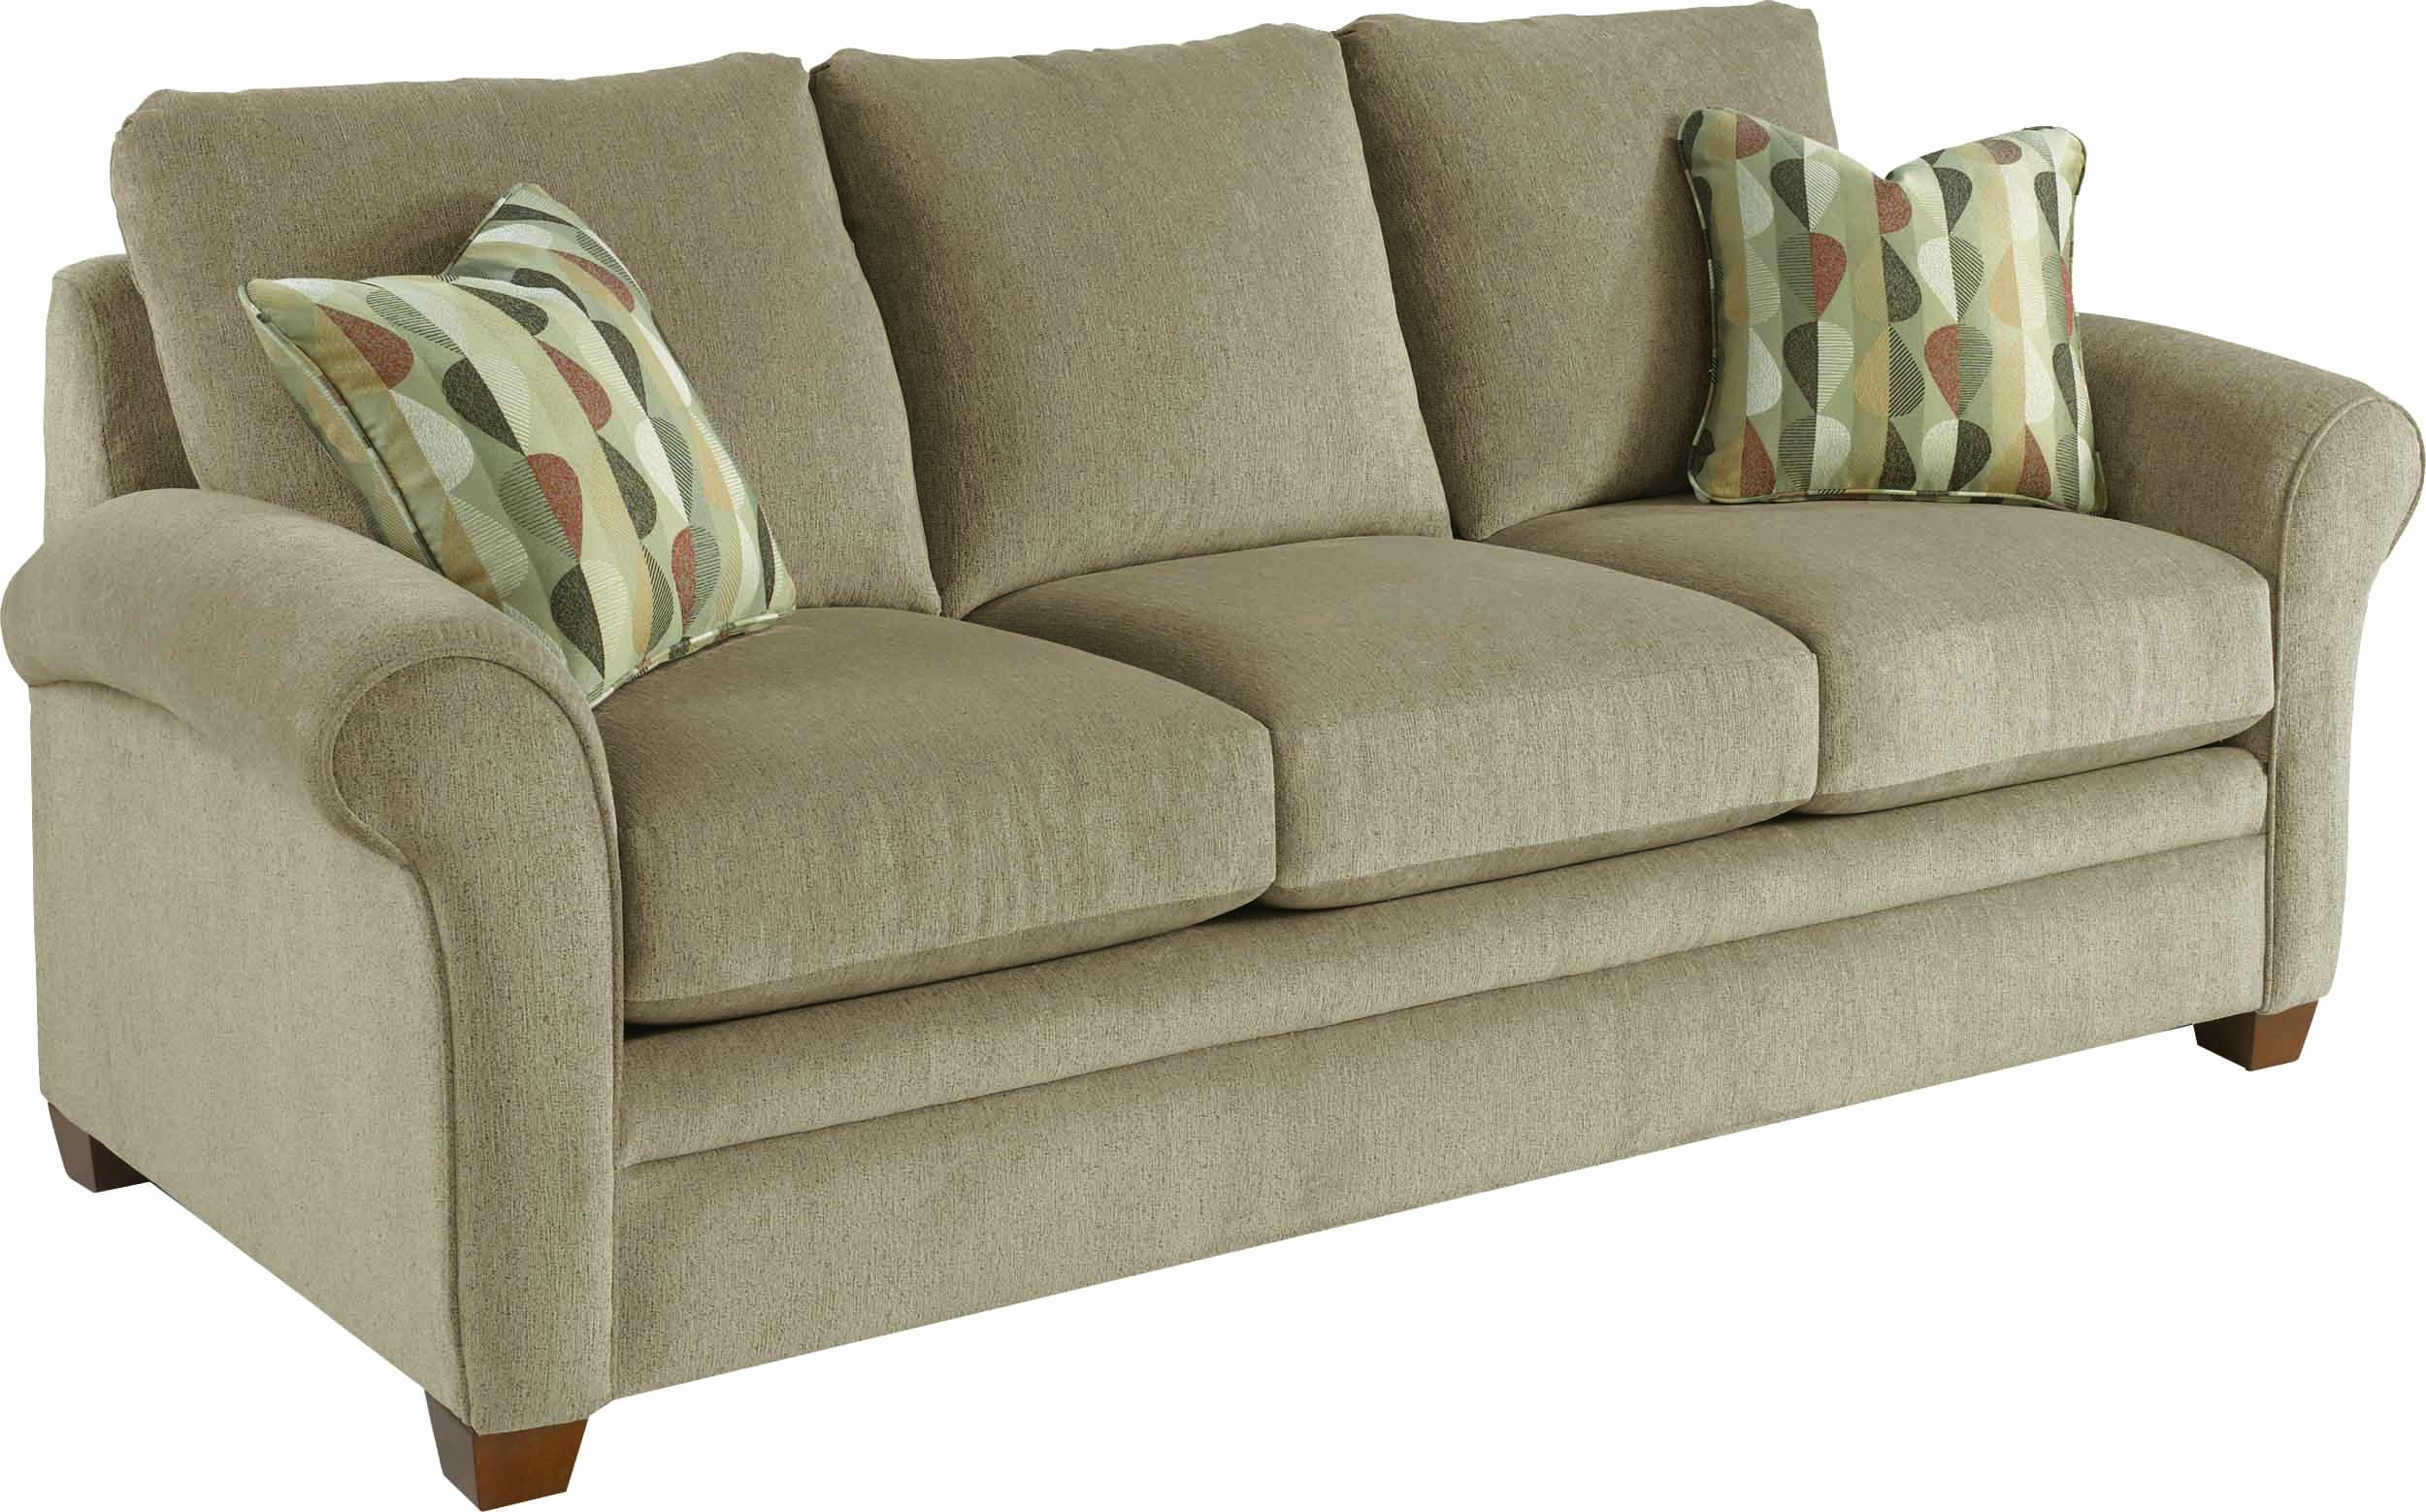 Leather Sleeper Sofa Shot Luxury Lazy Boy Ansugallery Check More